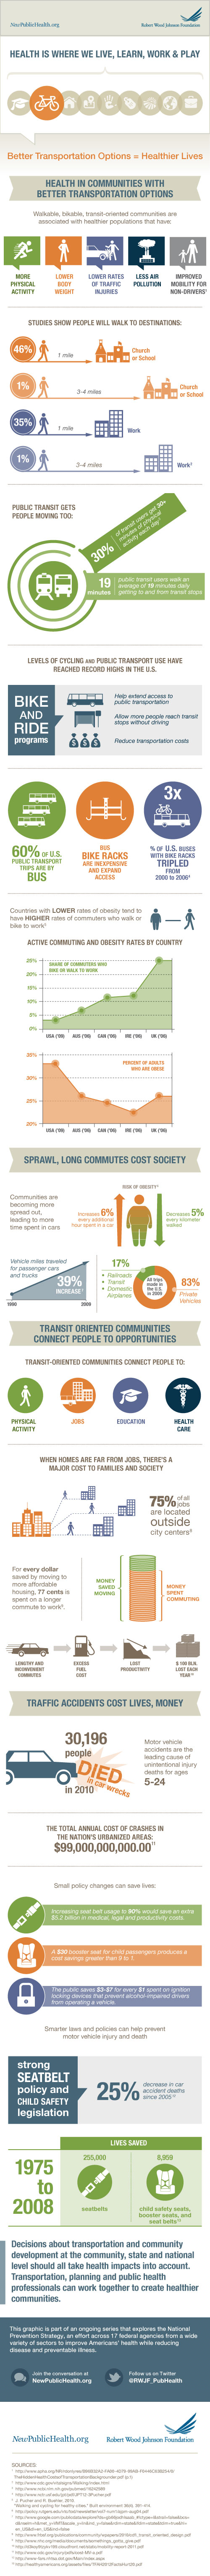 7. Better Transportation Options